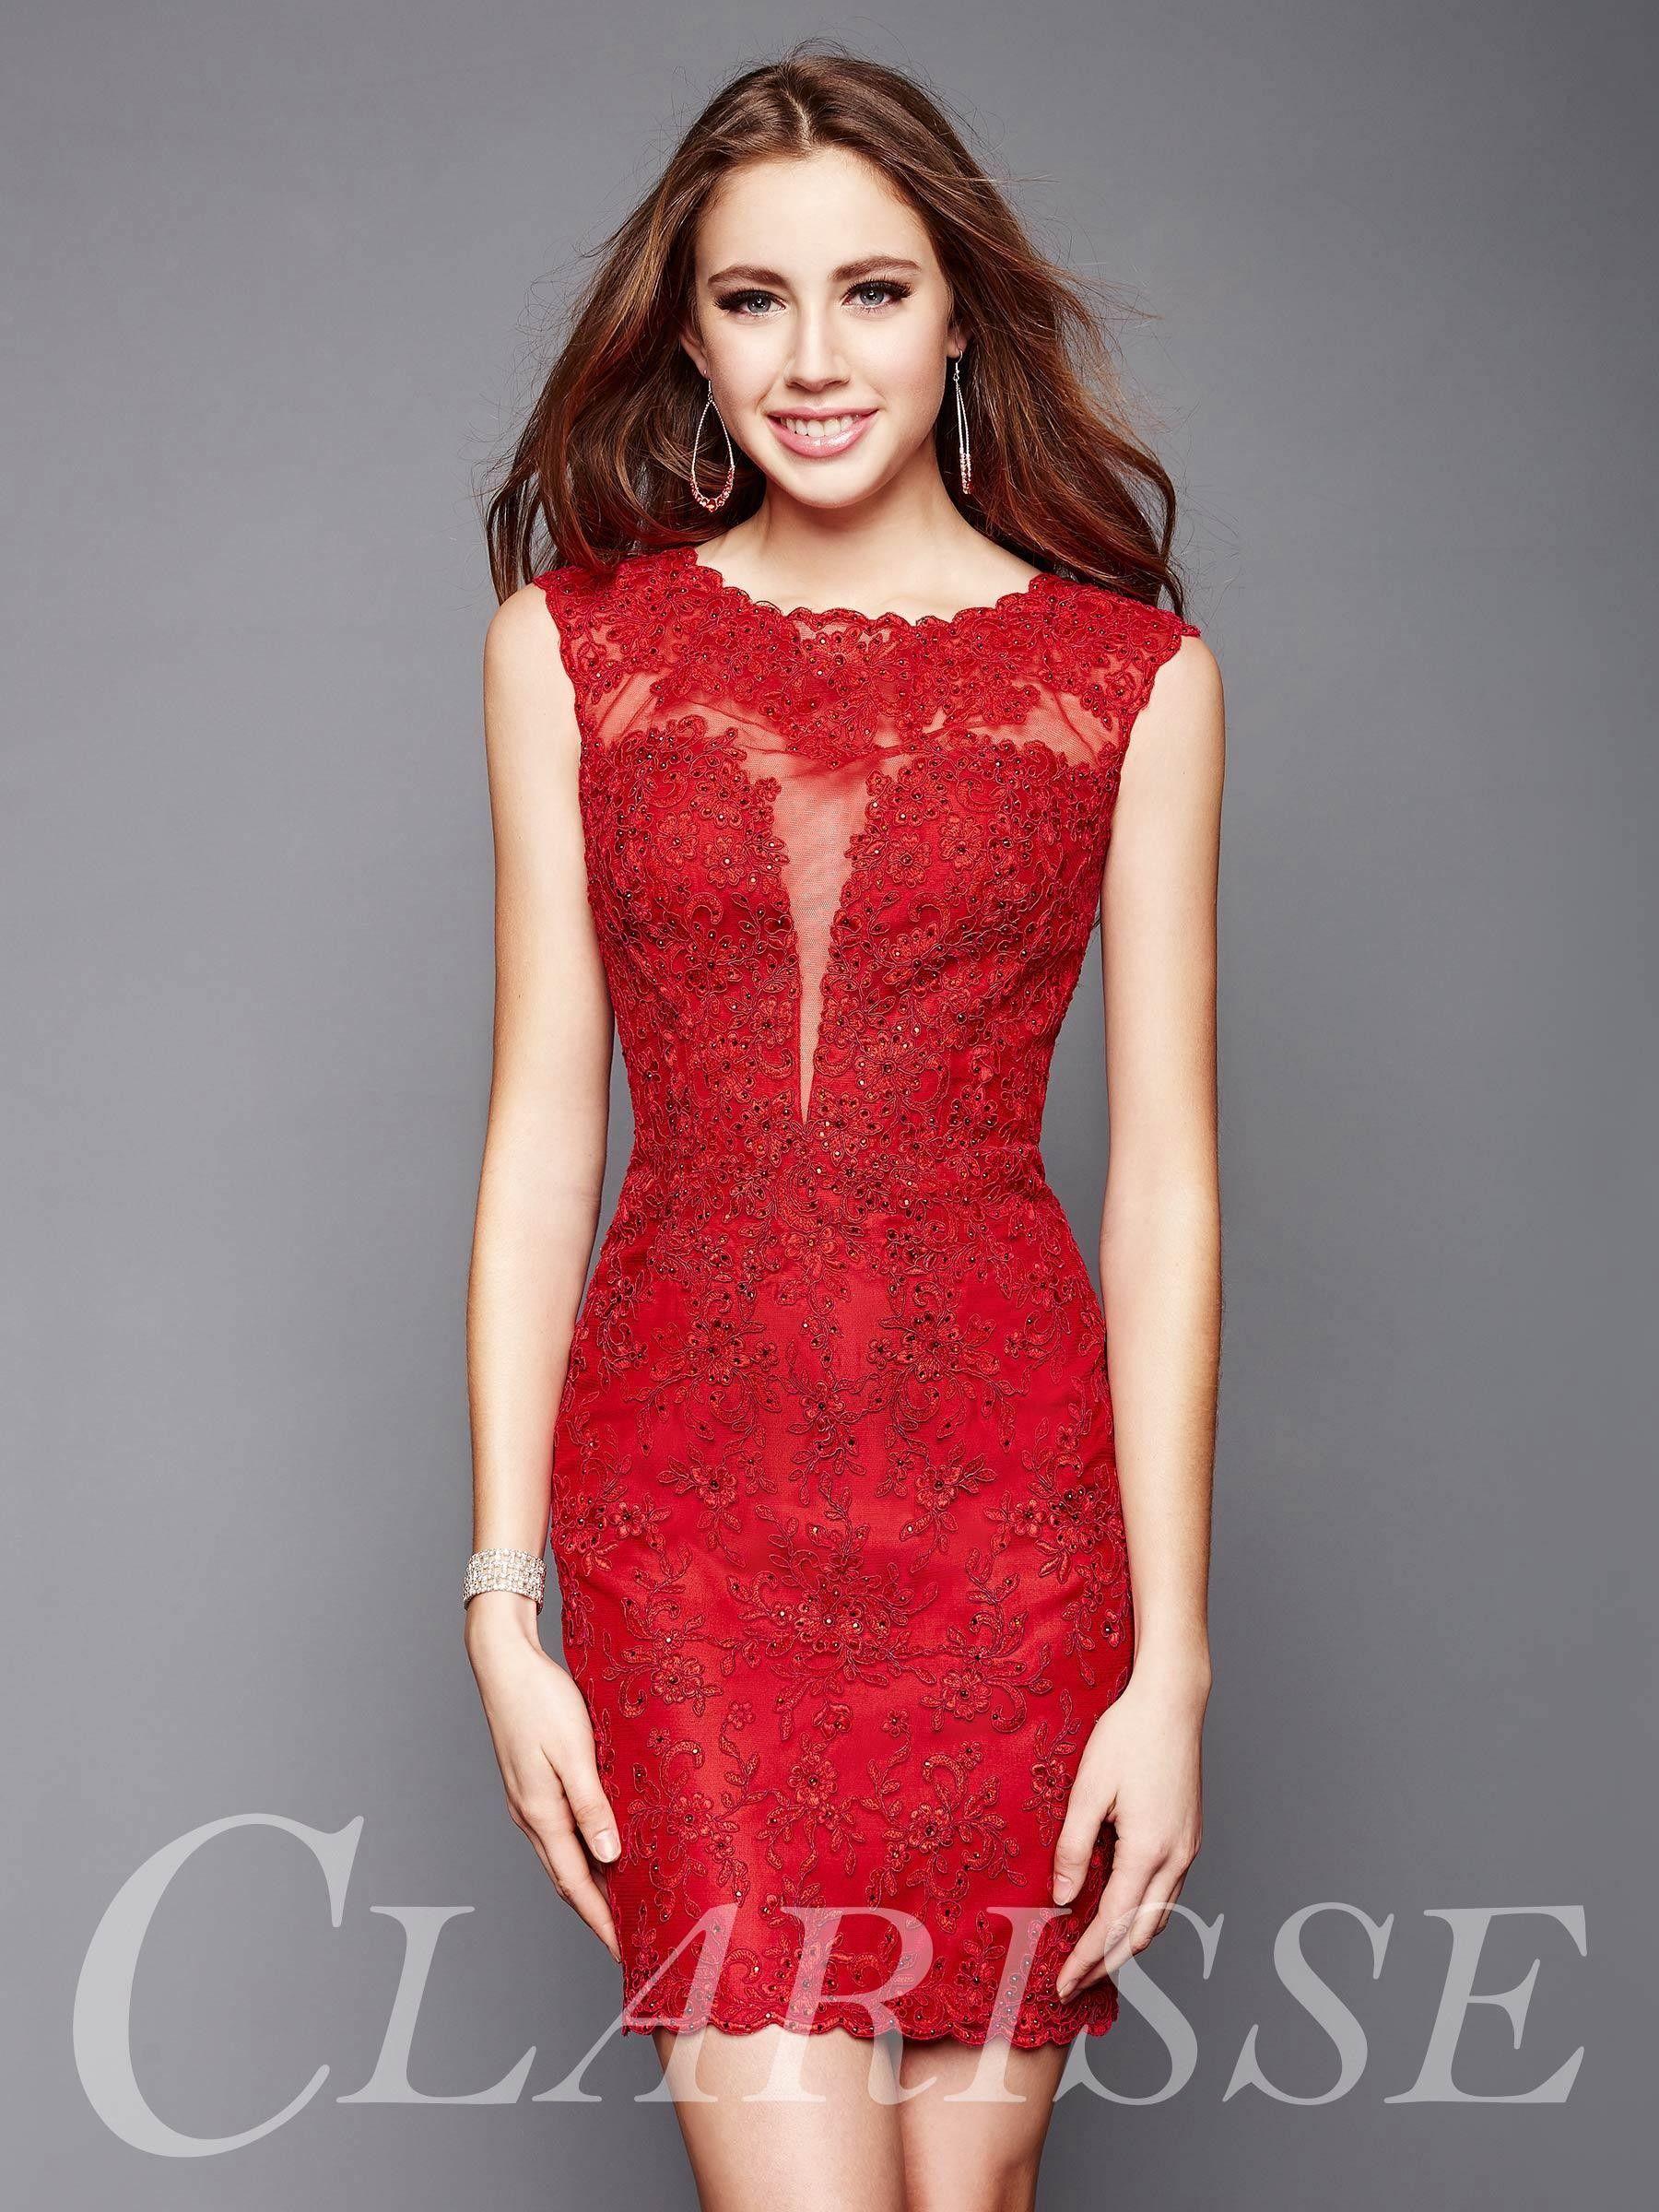 Romantic and ravishing, this daring cocktail dress rental is a ...